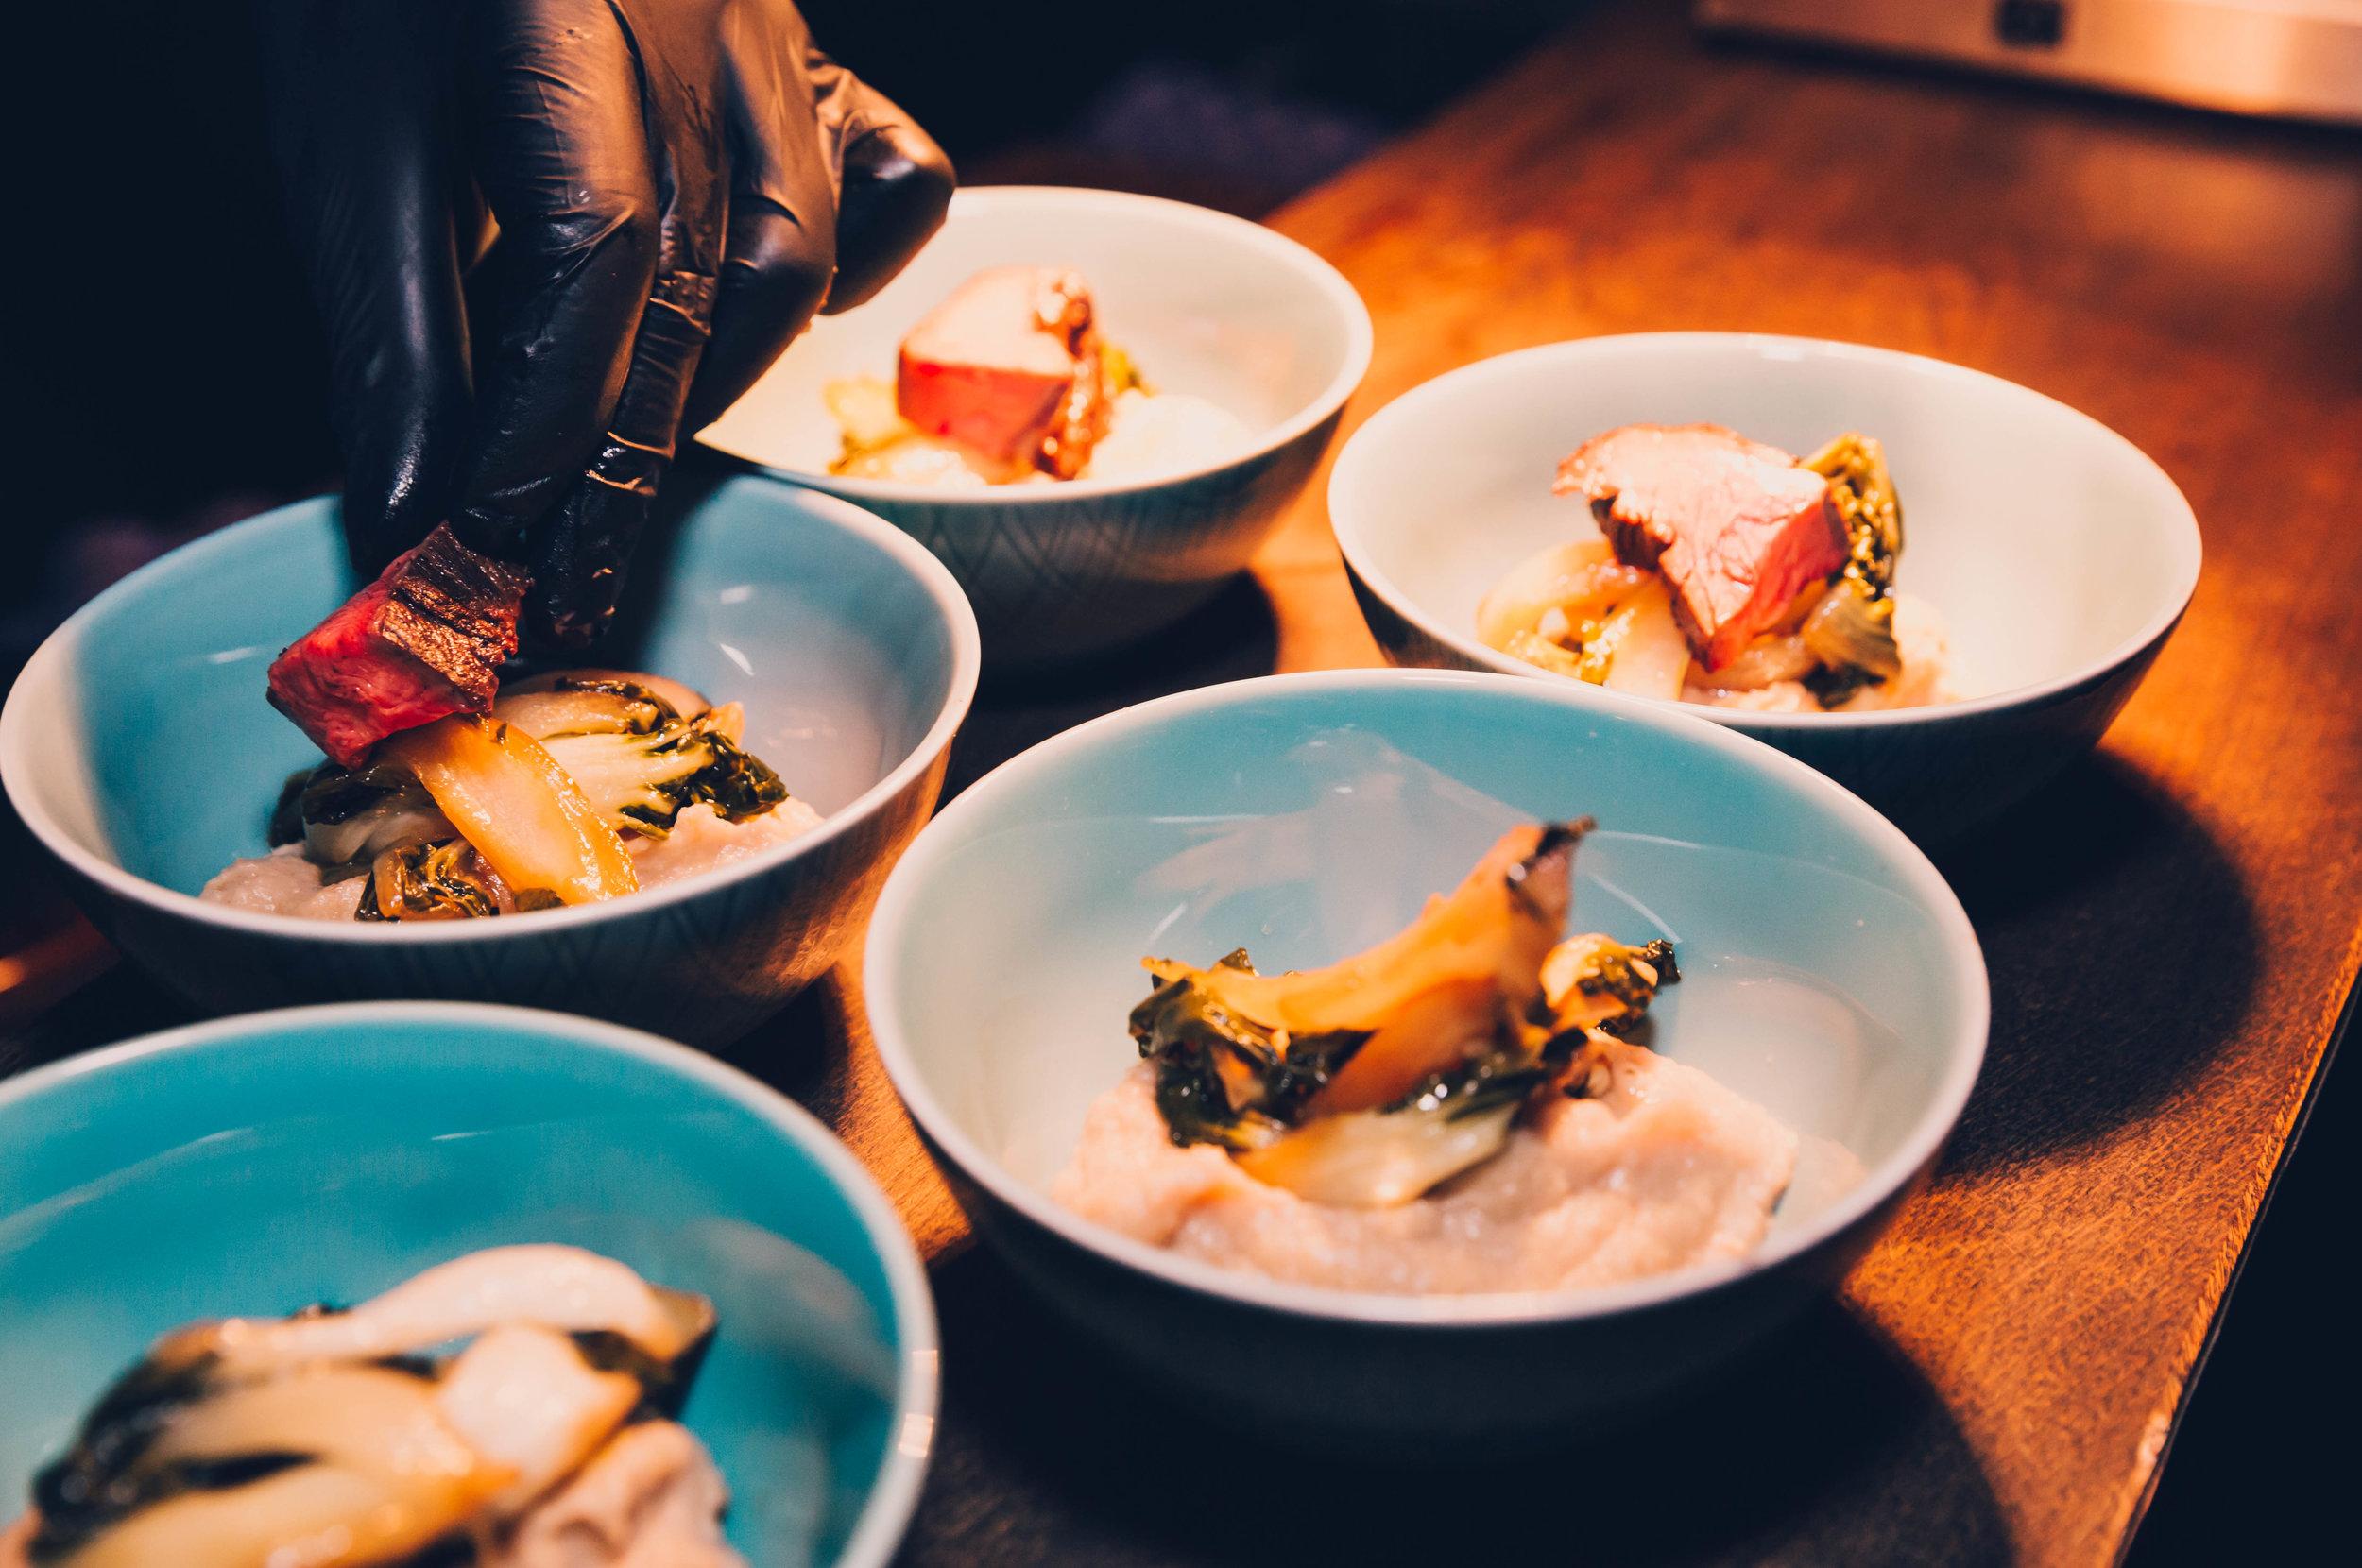 Live Food by Ricarda